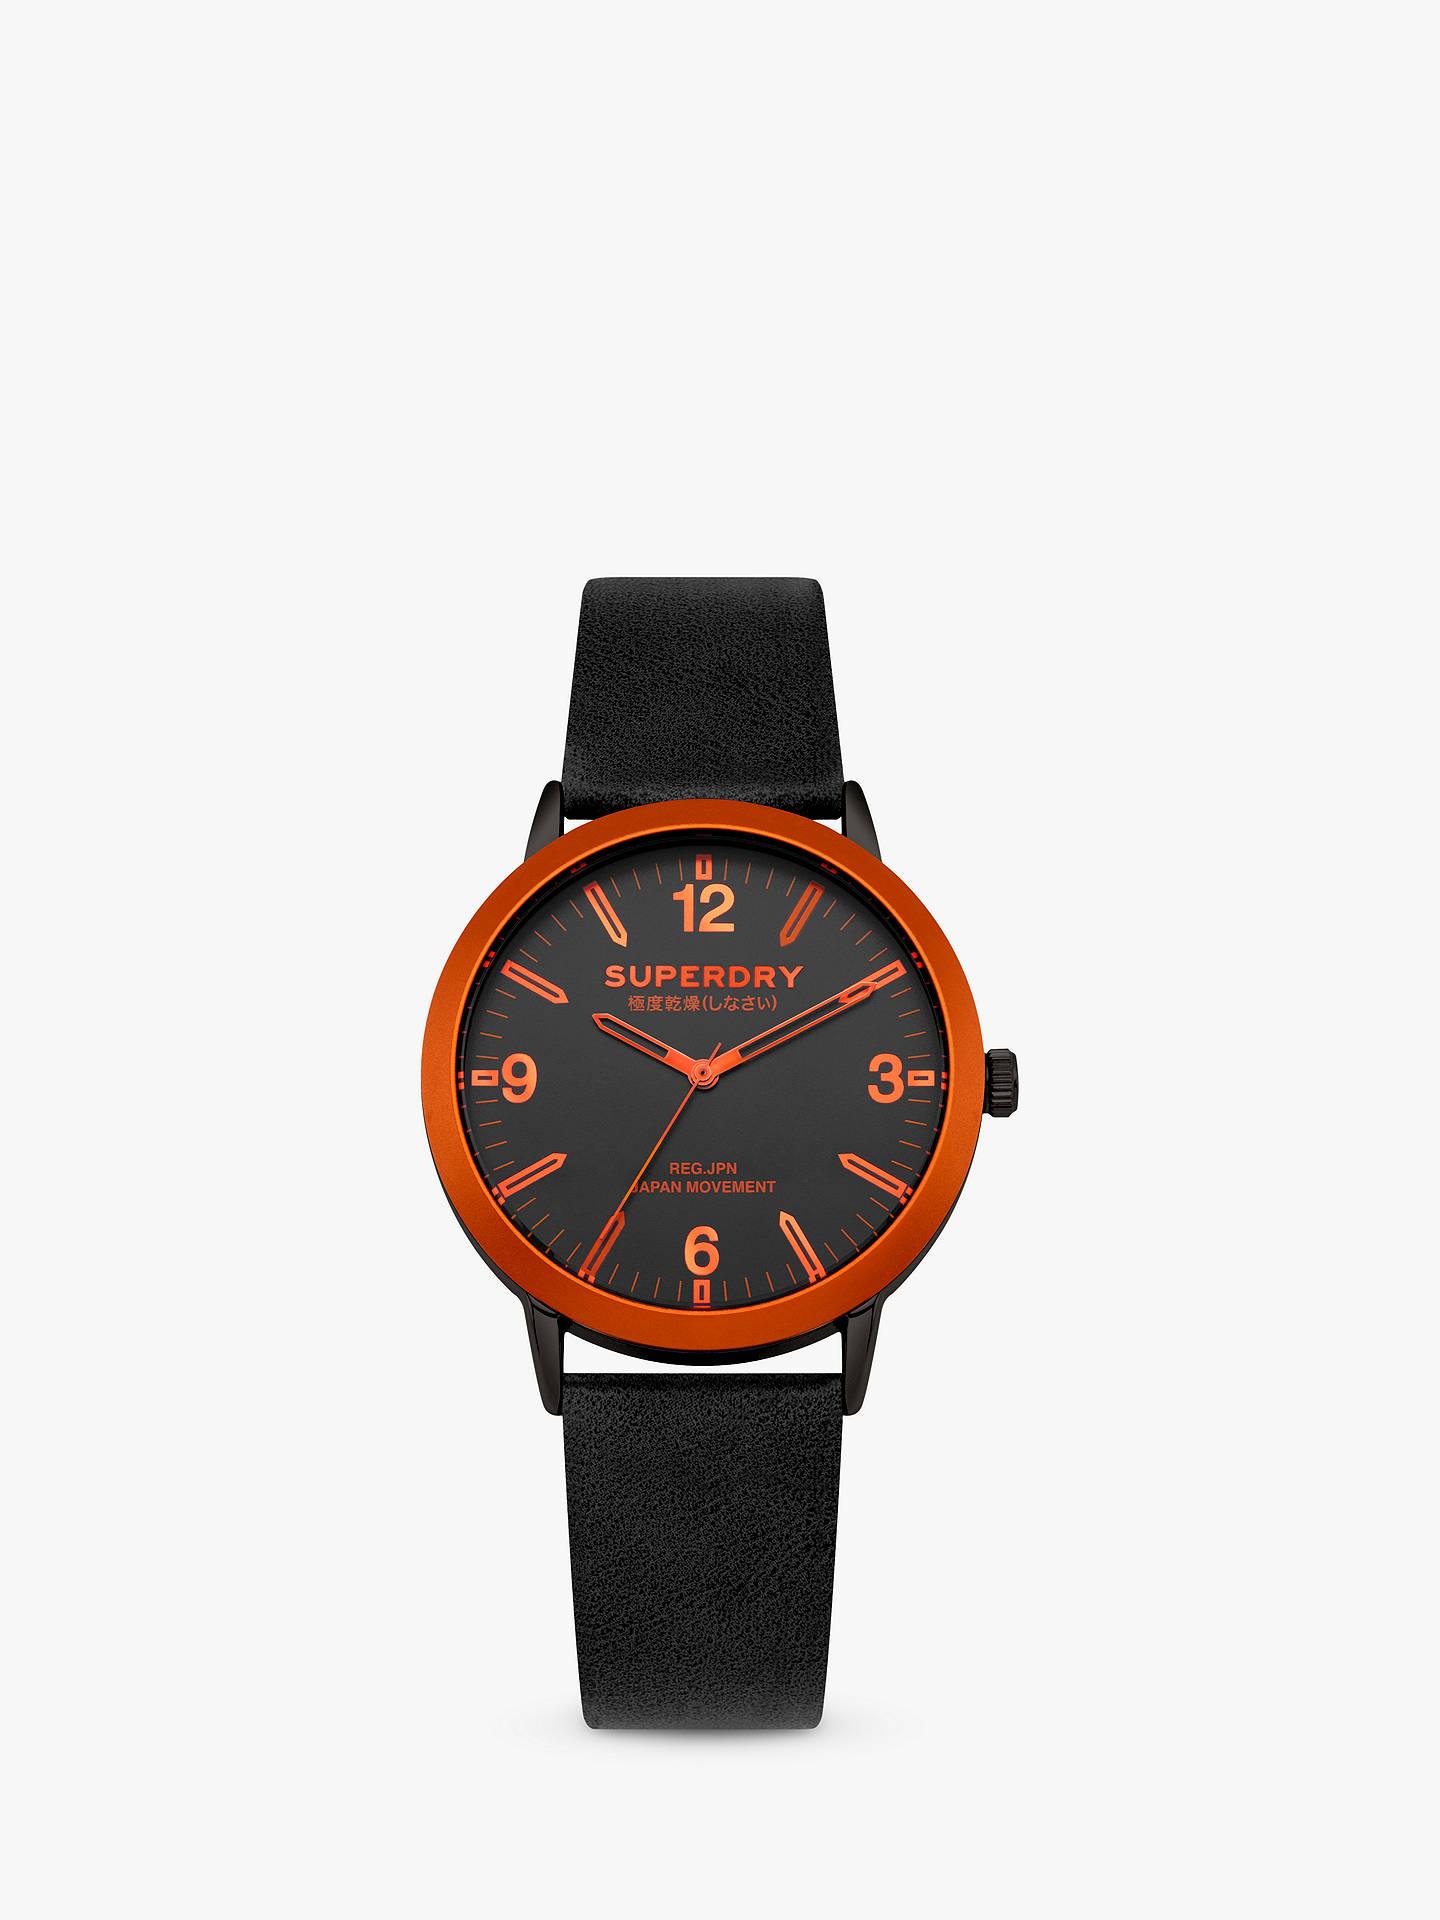 Superdry Syg259b Unisex Kobe Leather Strap Watch Black